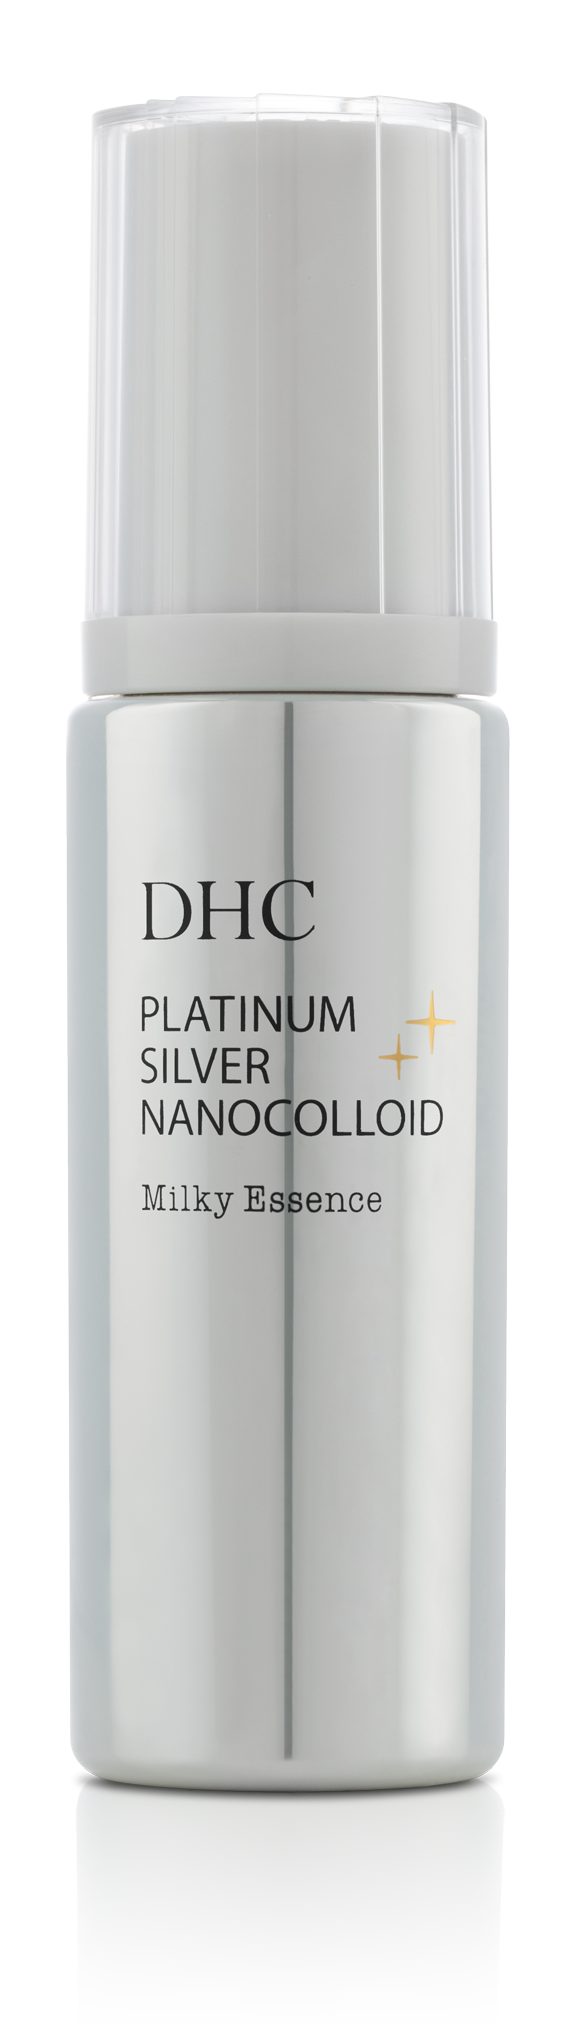 Platinum Silver Nanocolloid Milky Essence